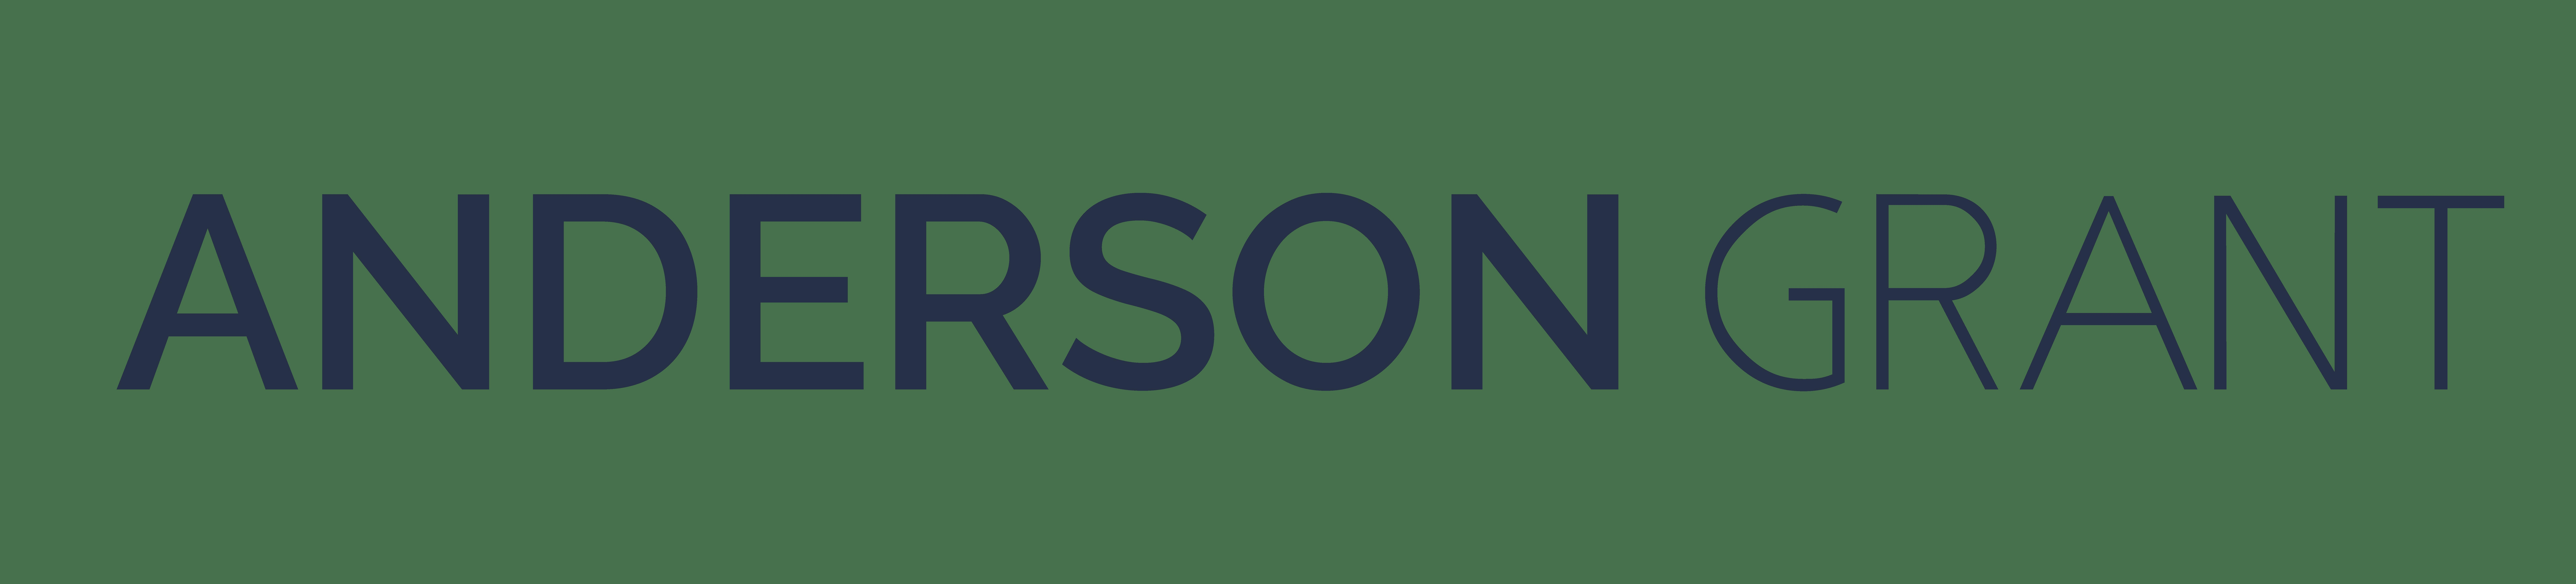 Anderson Grant Logo